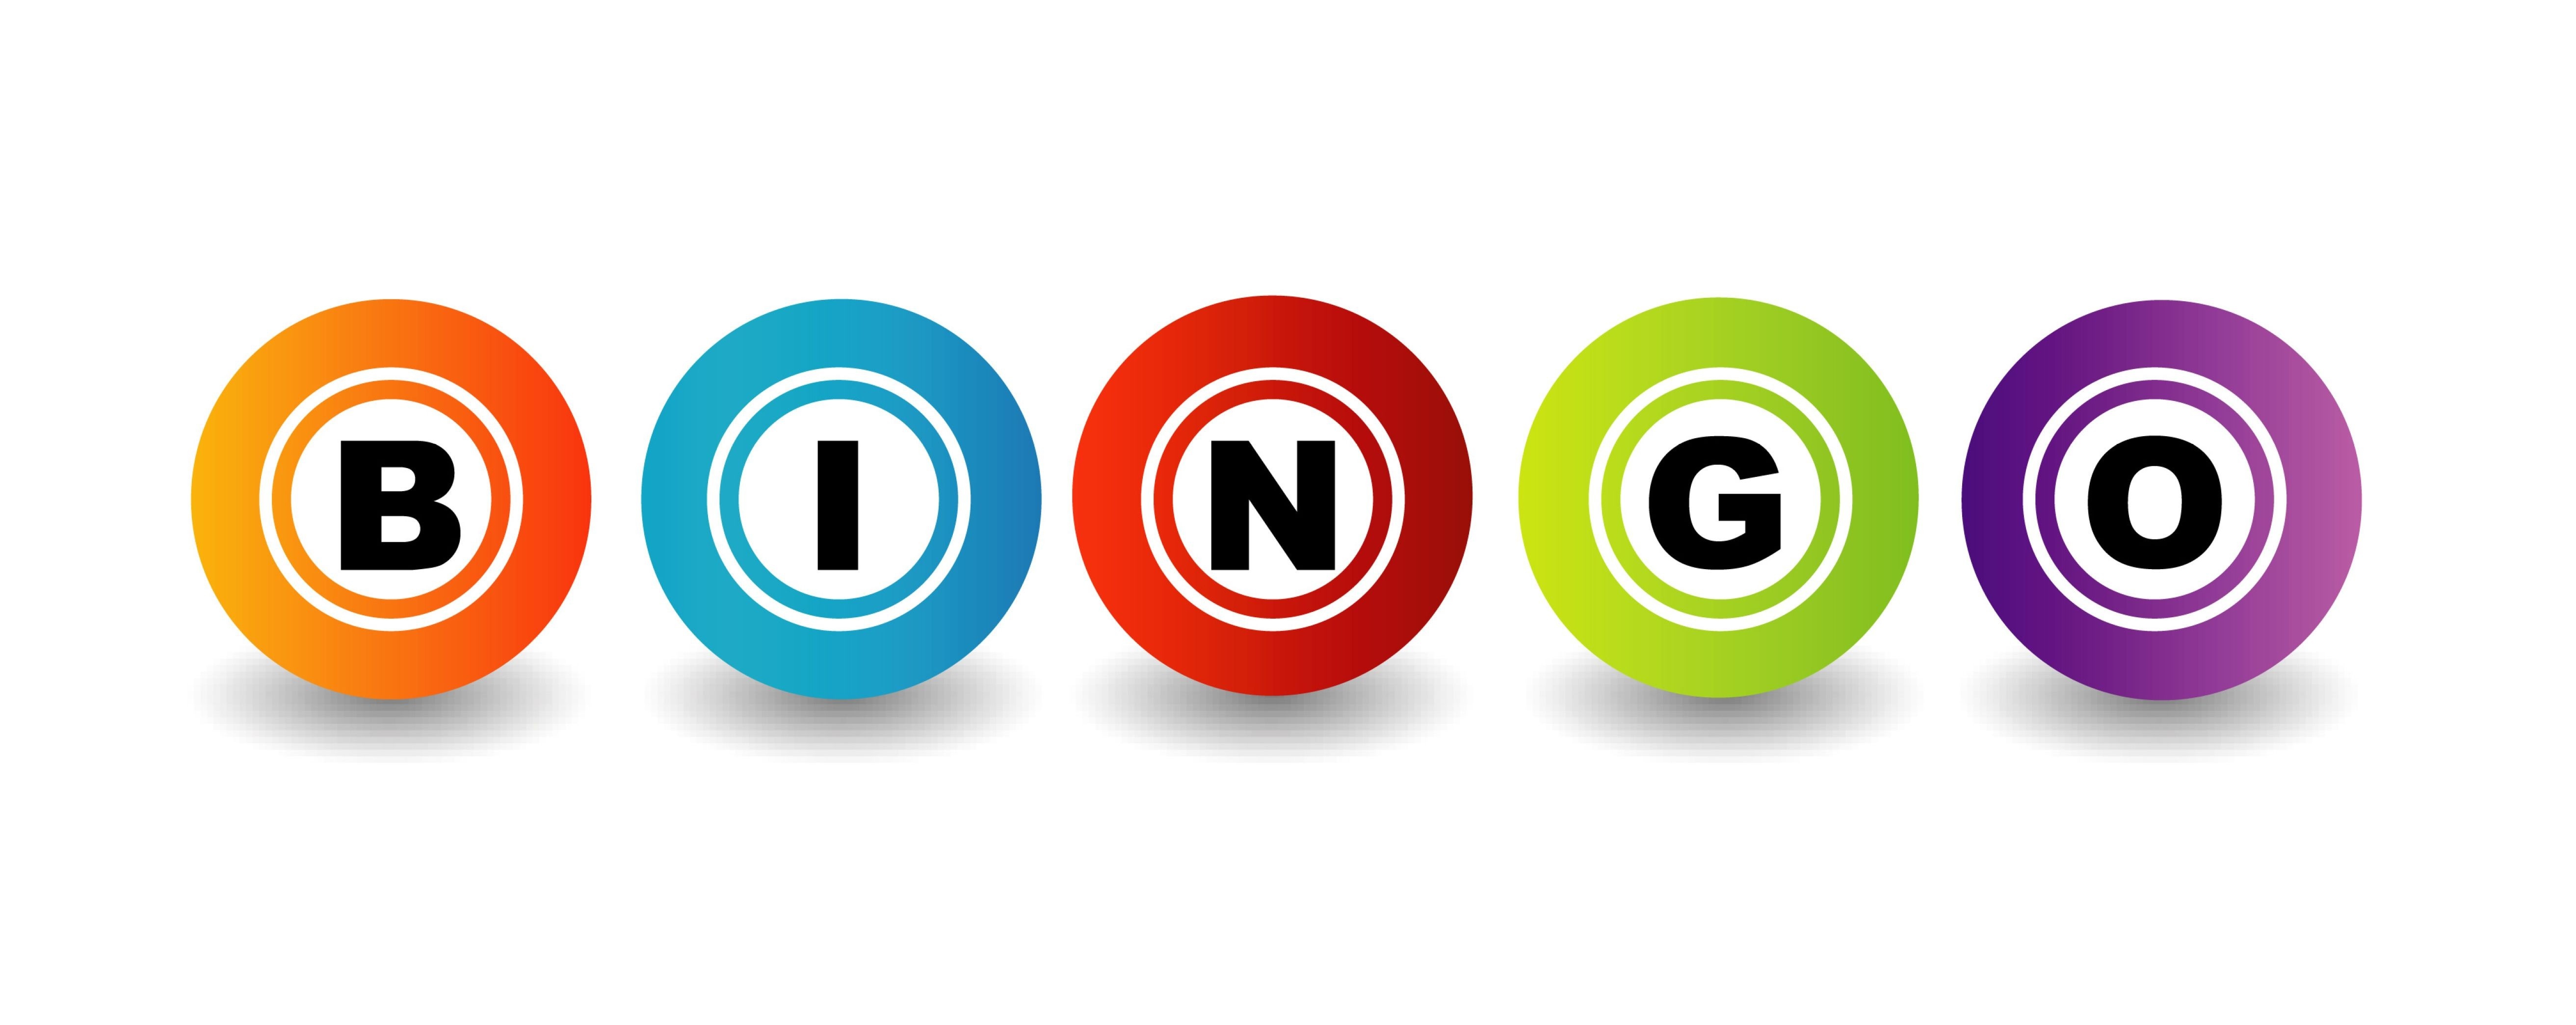 Bingo clipart logo.  transparent with